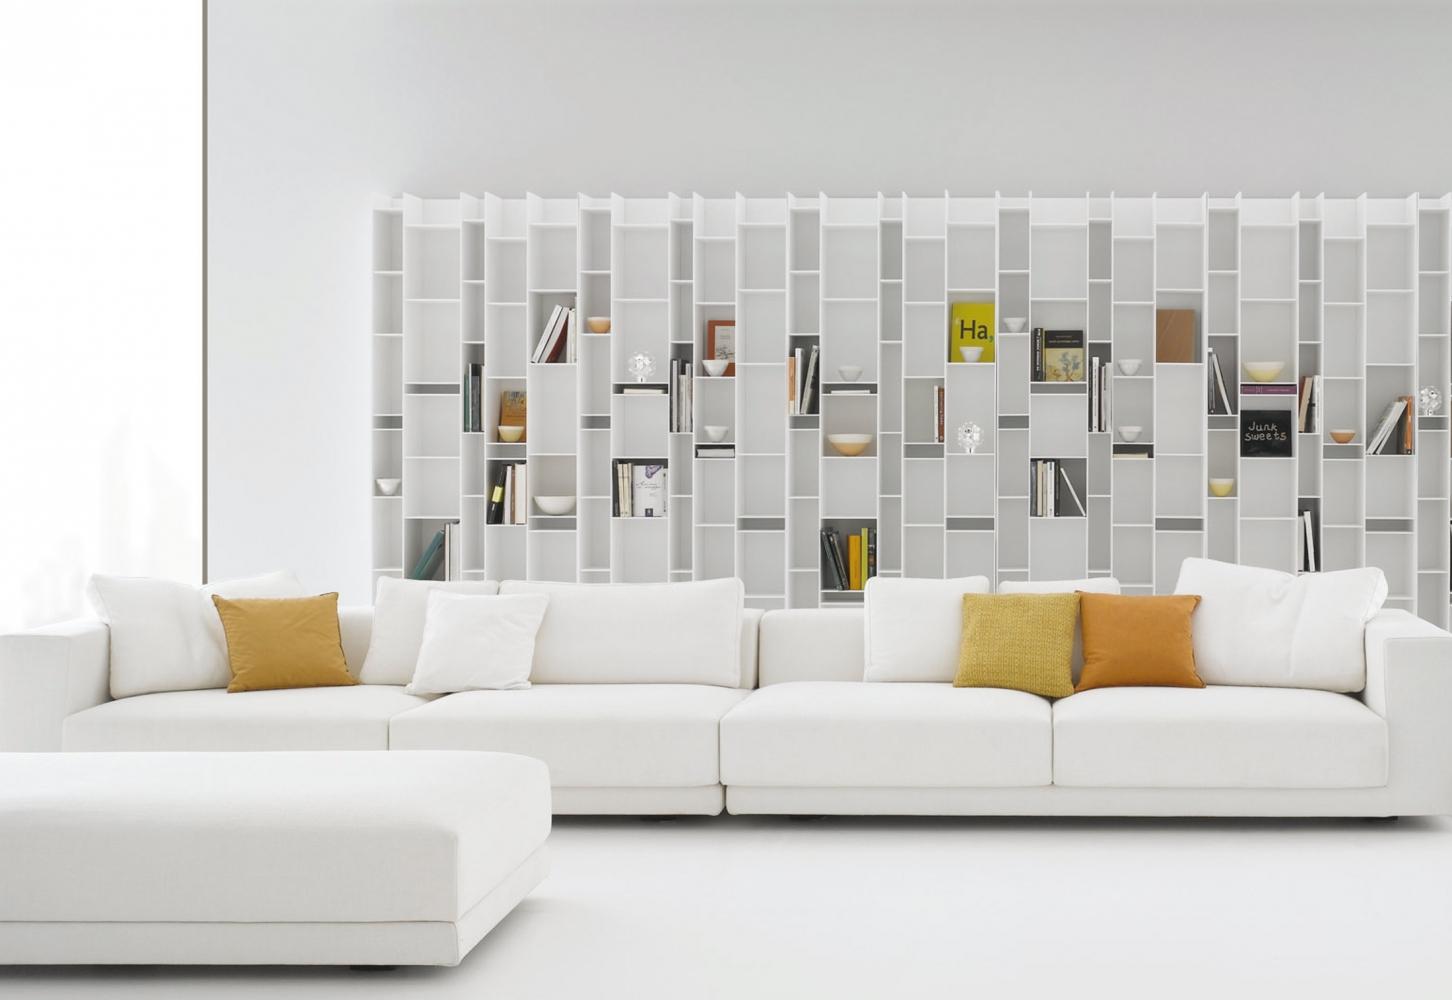 Mdf italia random boekenrek design neuland industriedesign for Libreria roche bobois